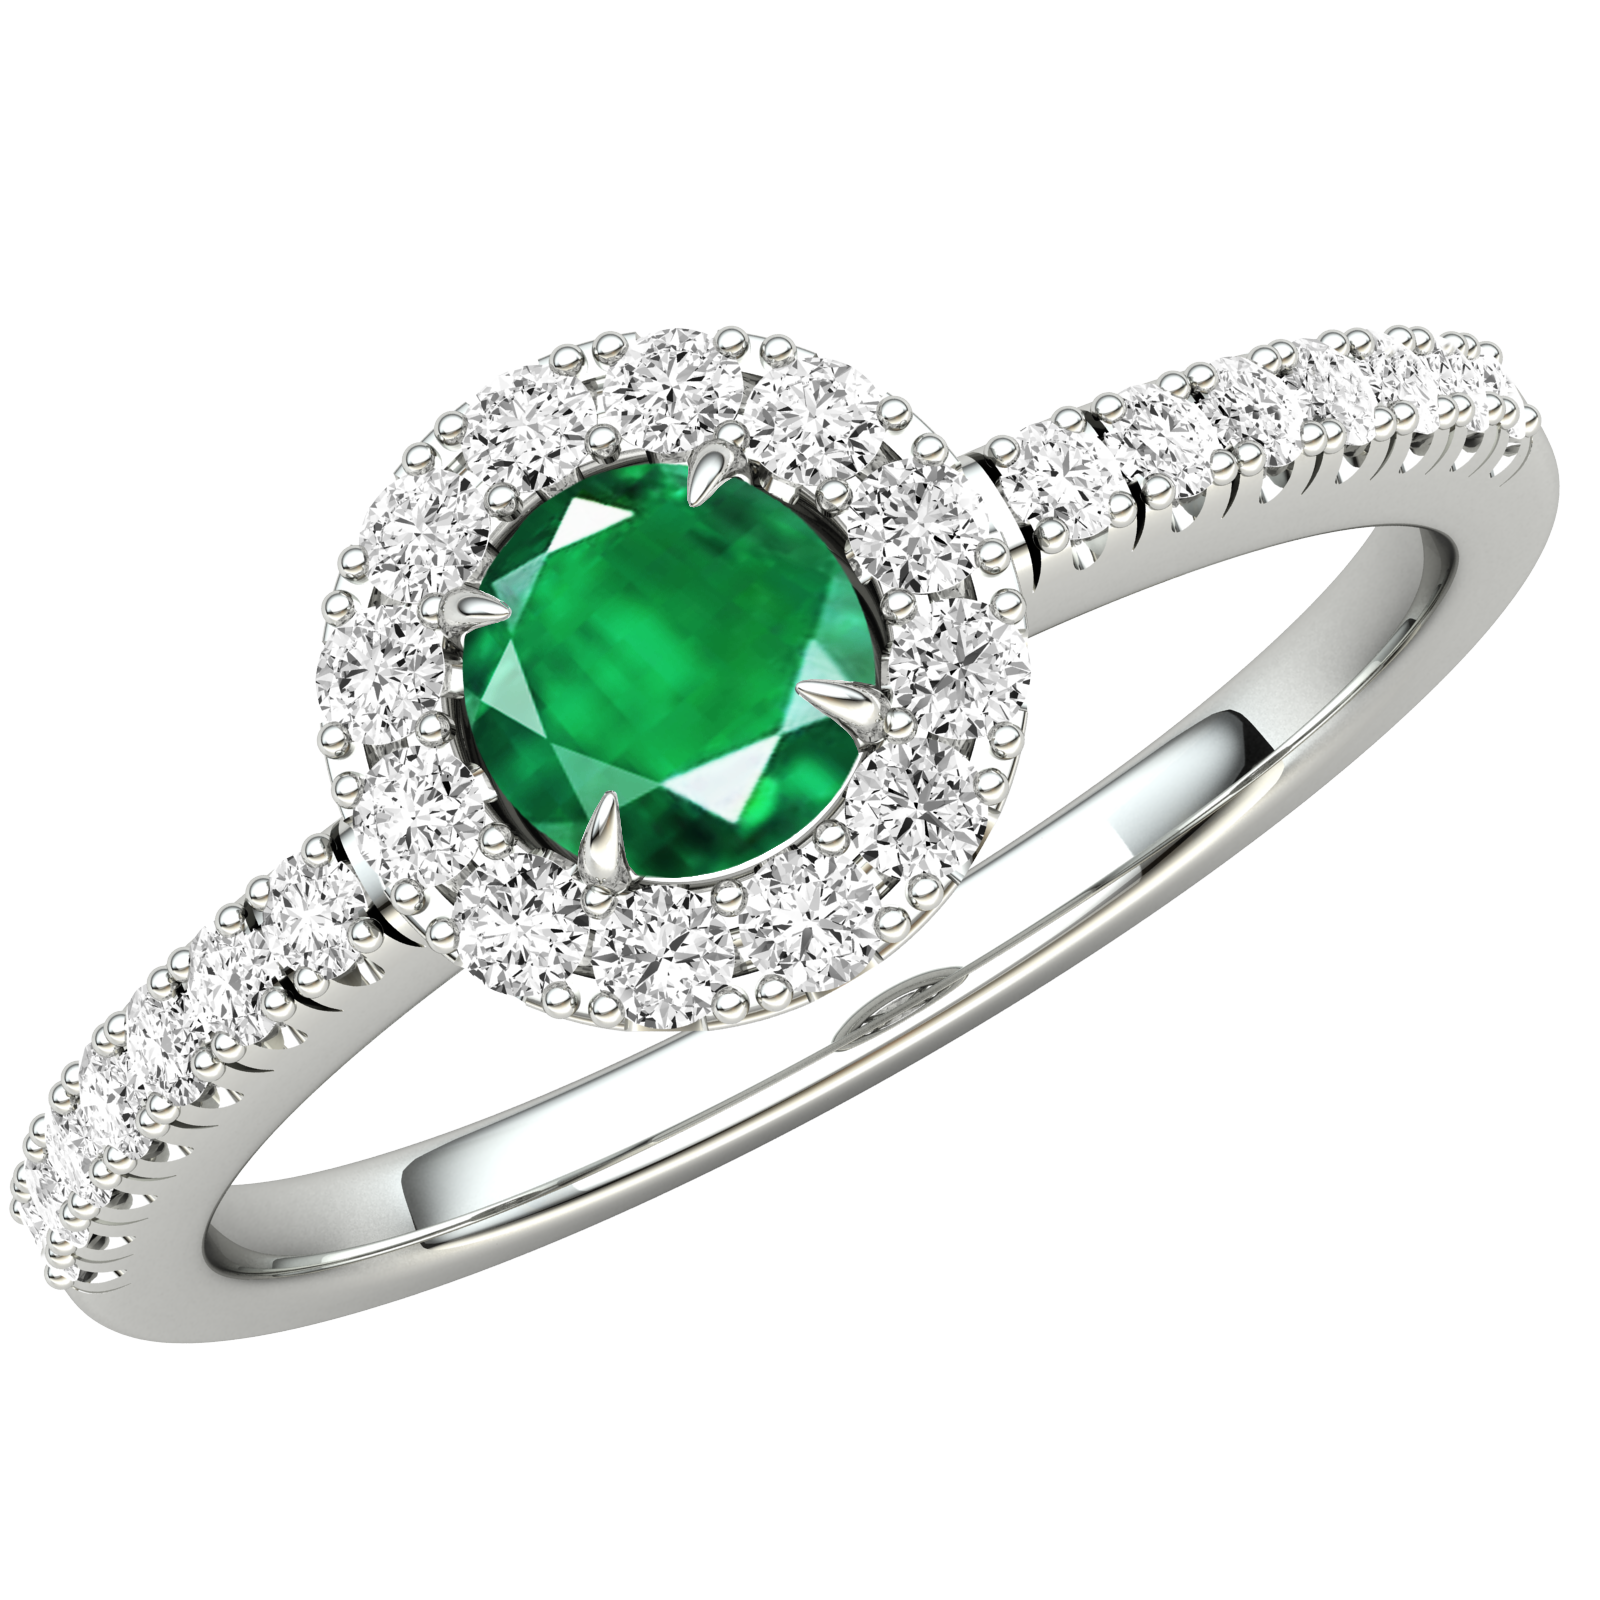 RDM675W-Inel cu Smarald si Diamante Dama Aur Alb 18kt cu un Smarald in Centru si Diamante Rotunde Briliant, Stil Halo si Diamante Laterale-img1